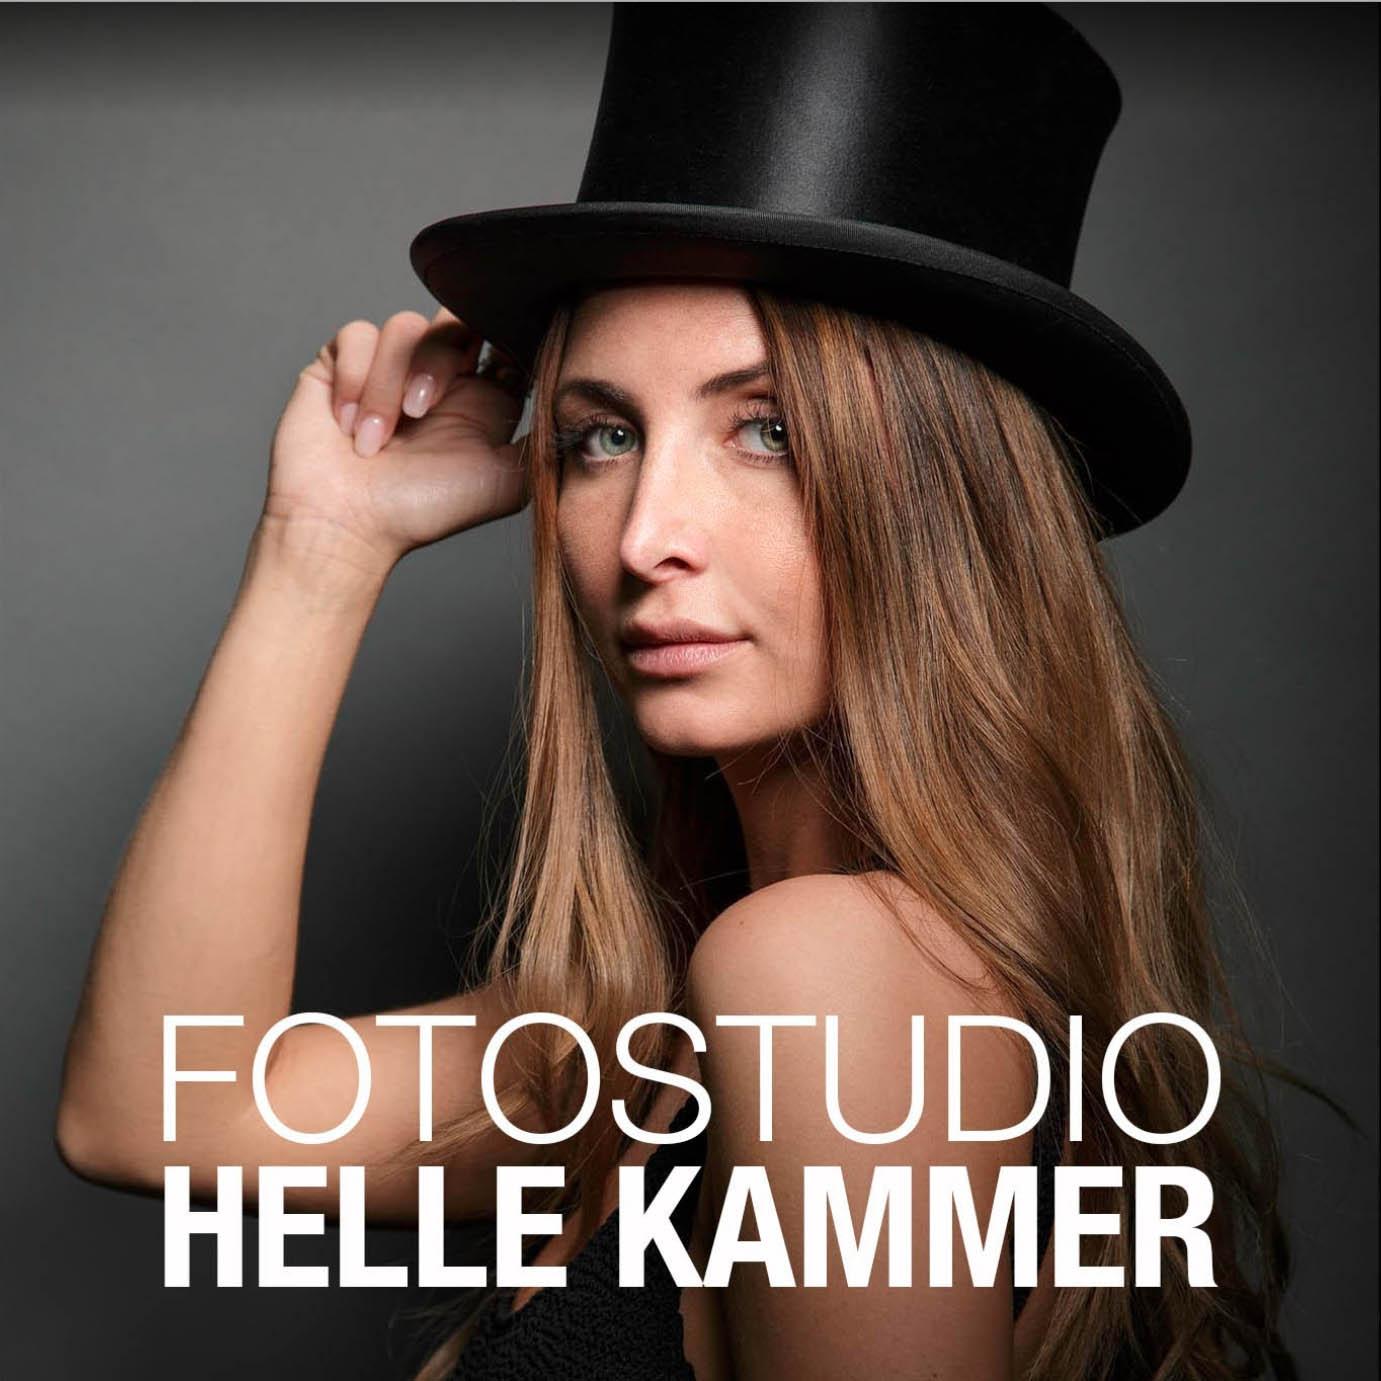 Fotostudio Helle Kammer